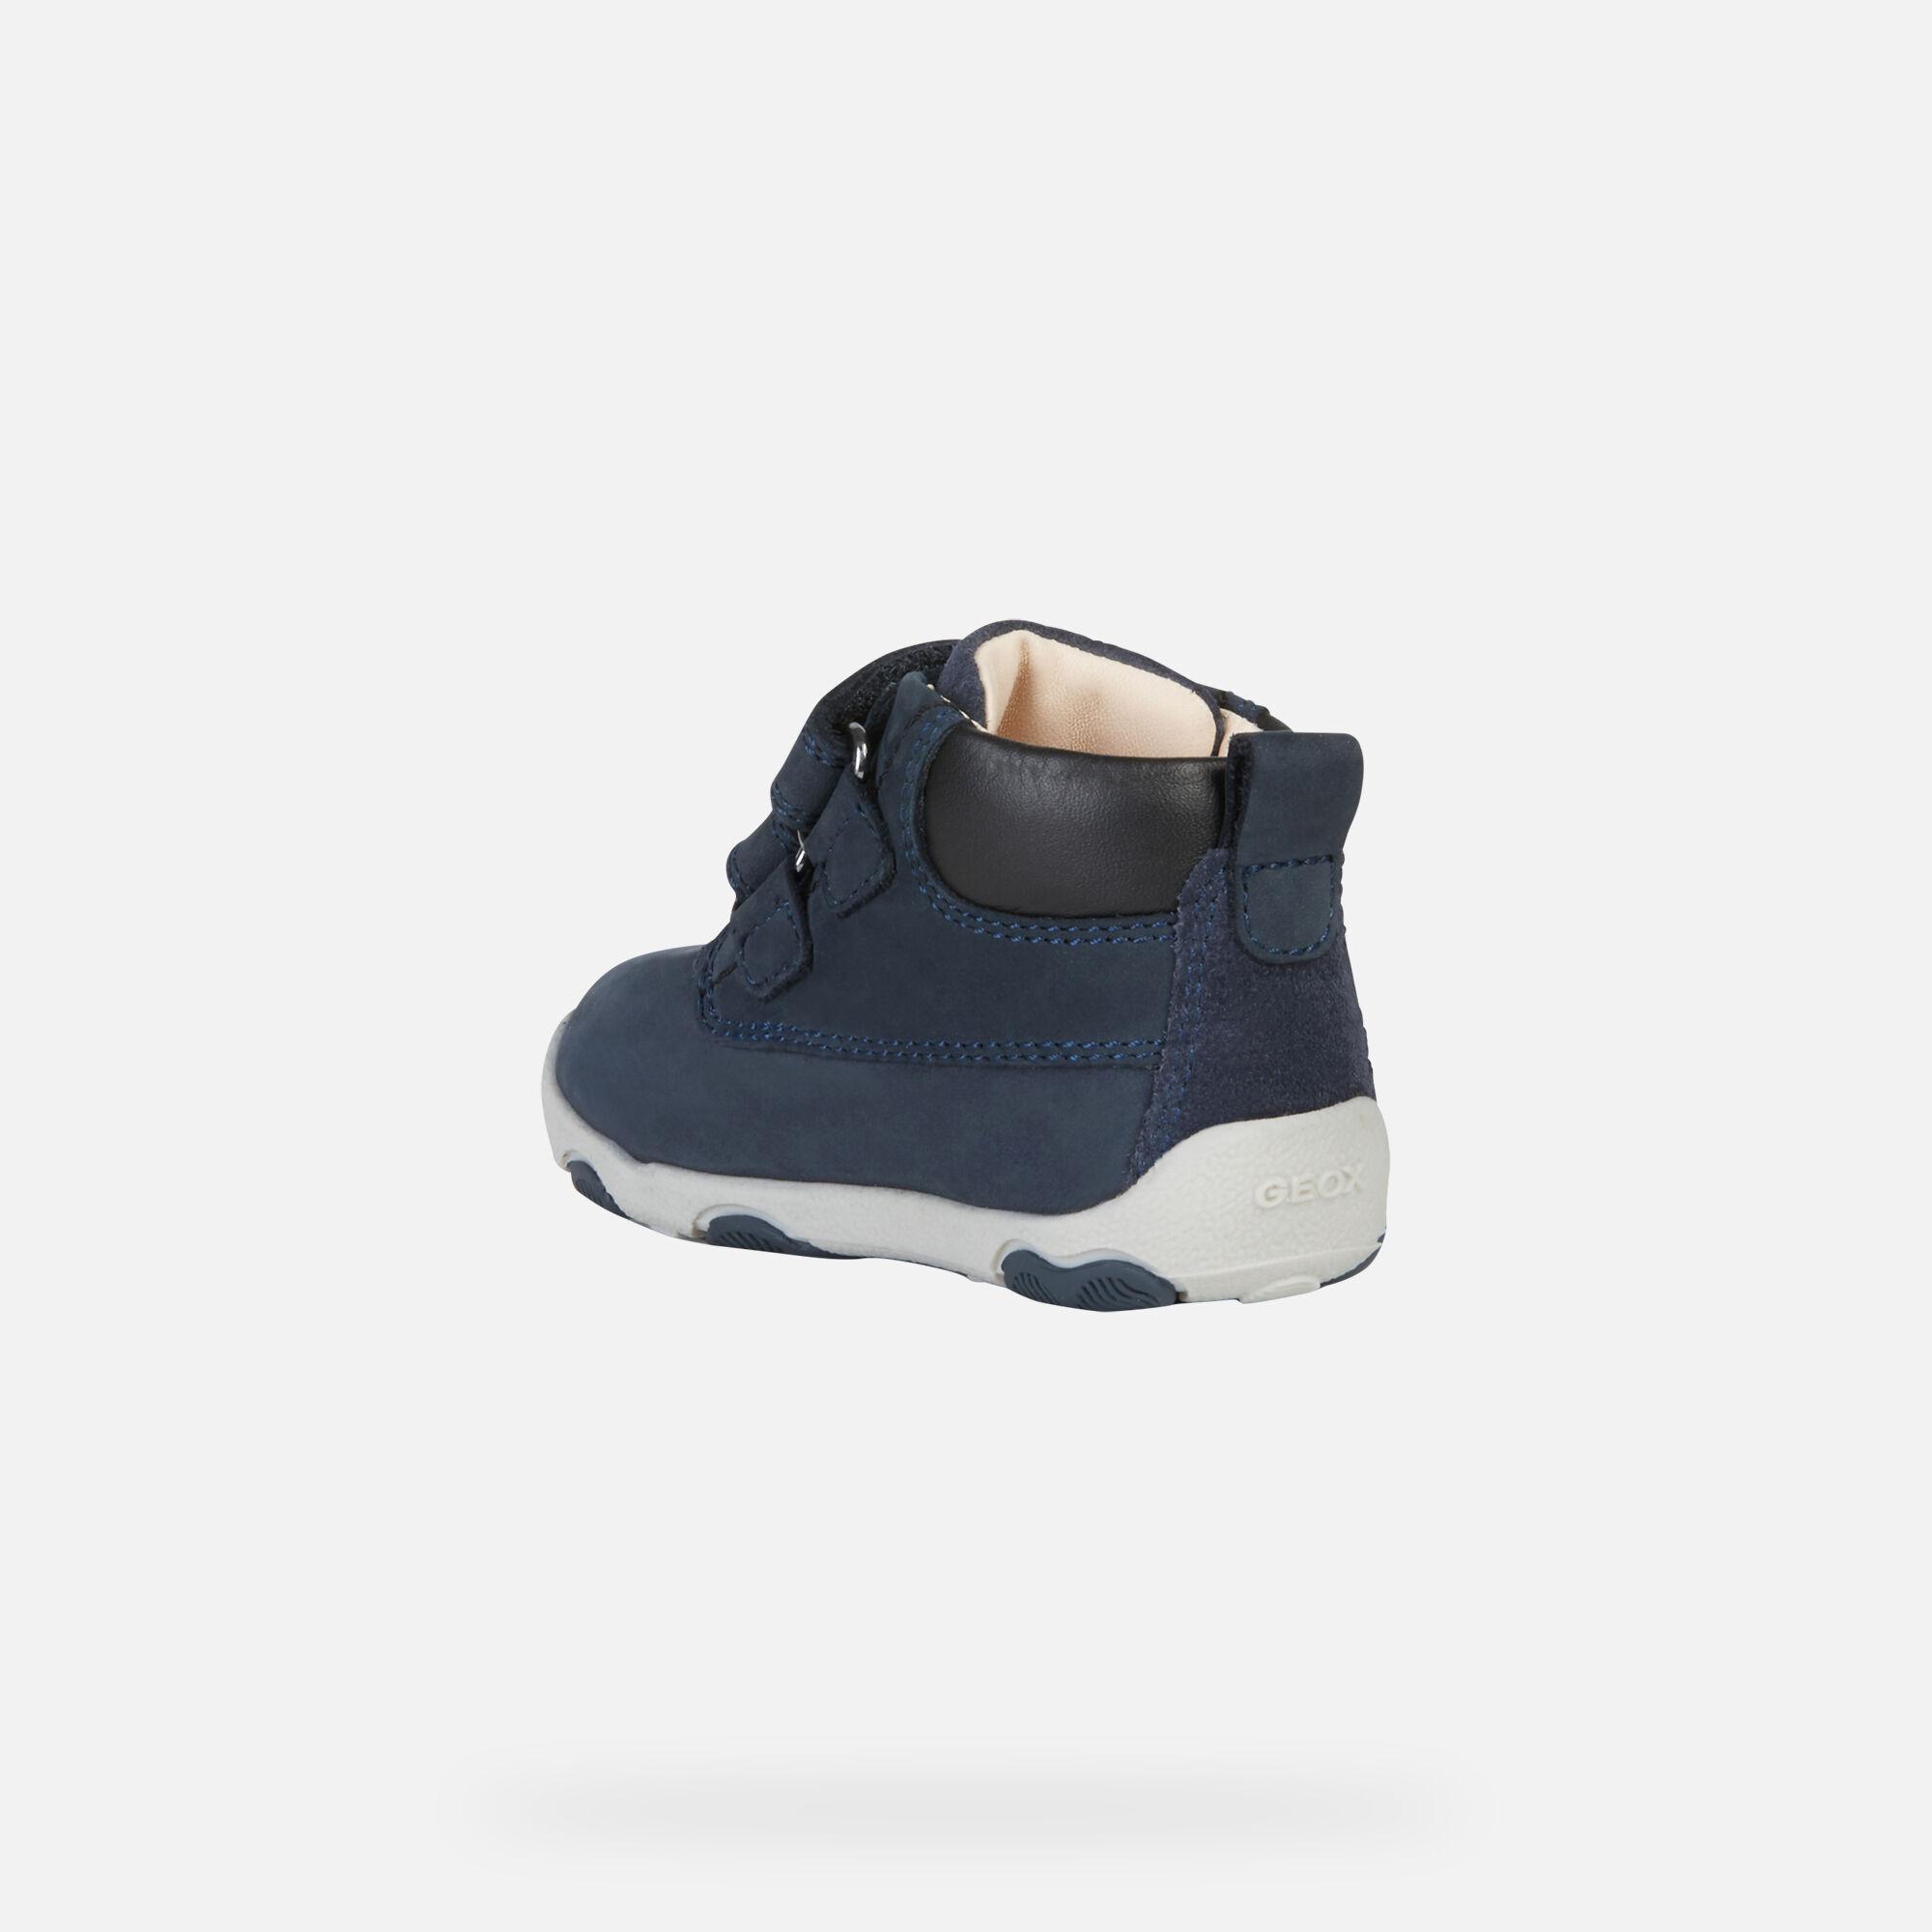 Geox NEW BALU' Neonato: Scarpe Primi Passi Blu   Geox ®